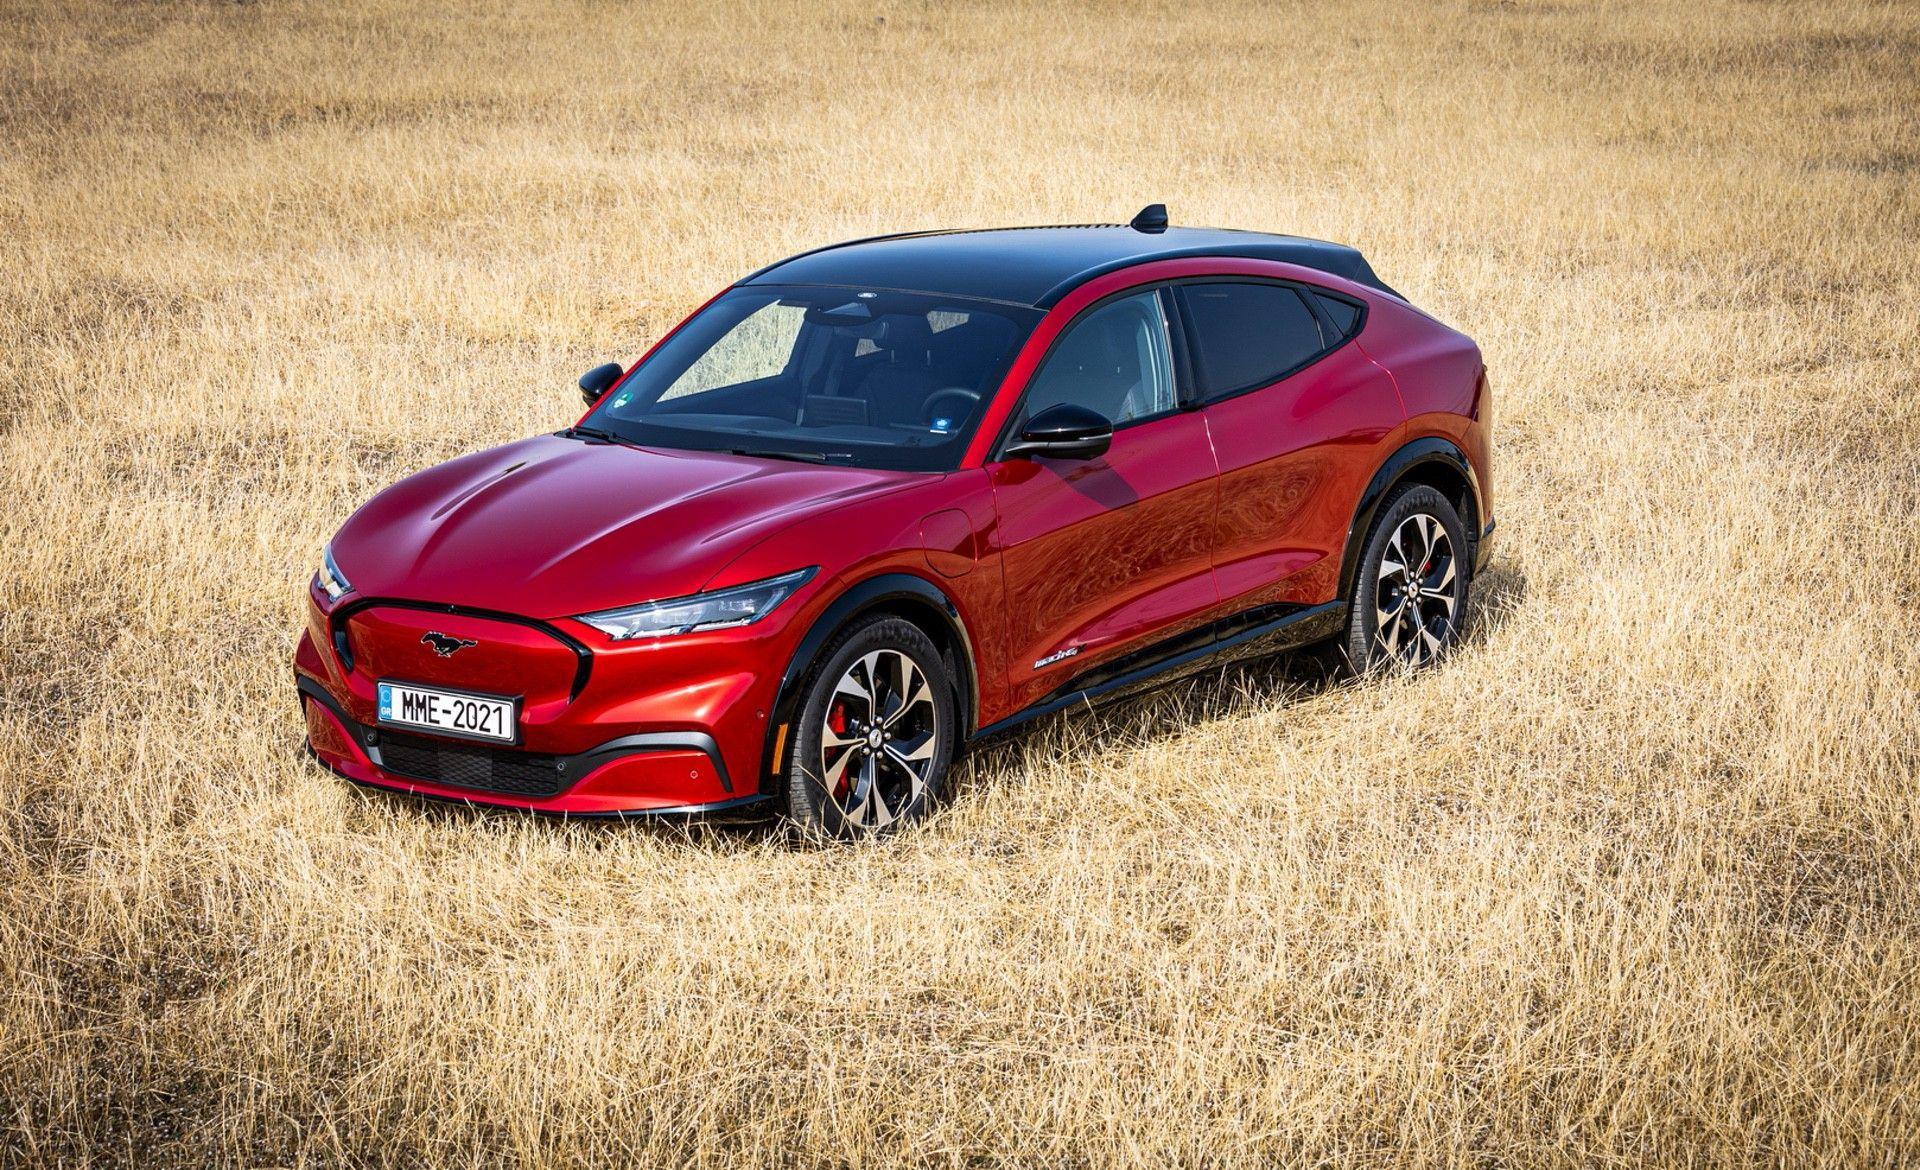 Ford_Mustang_Mach-E_greek_presskit-0009